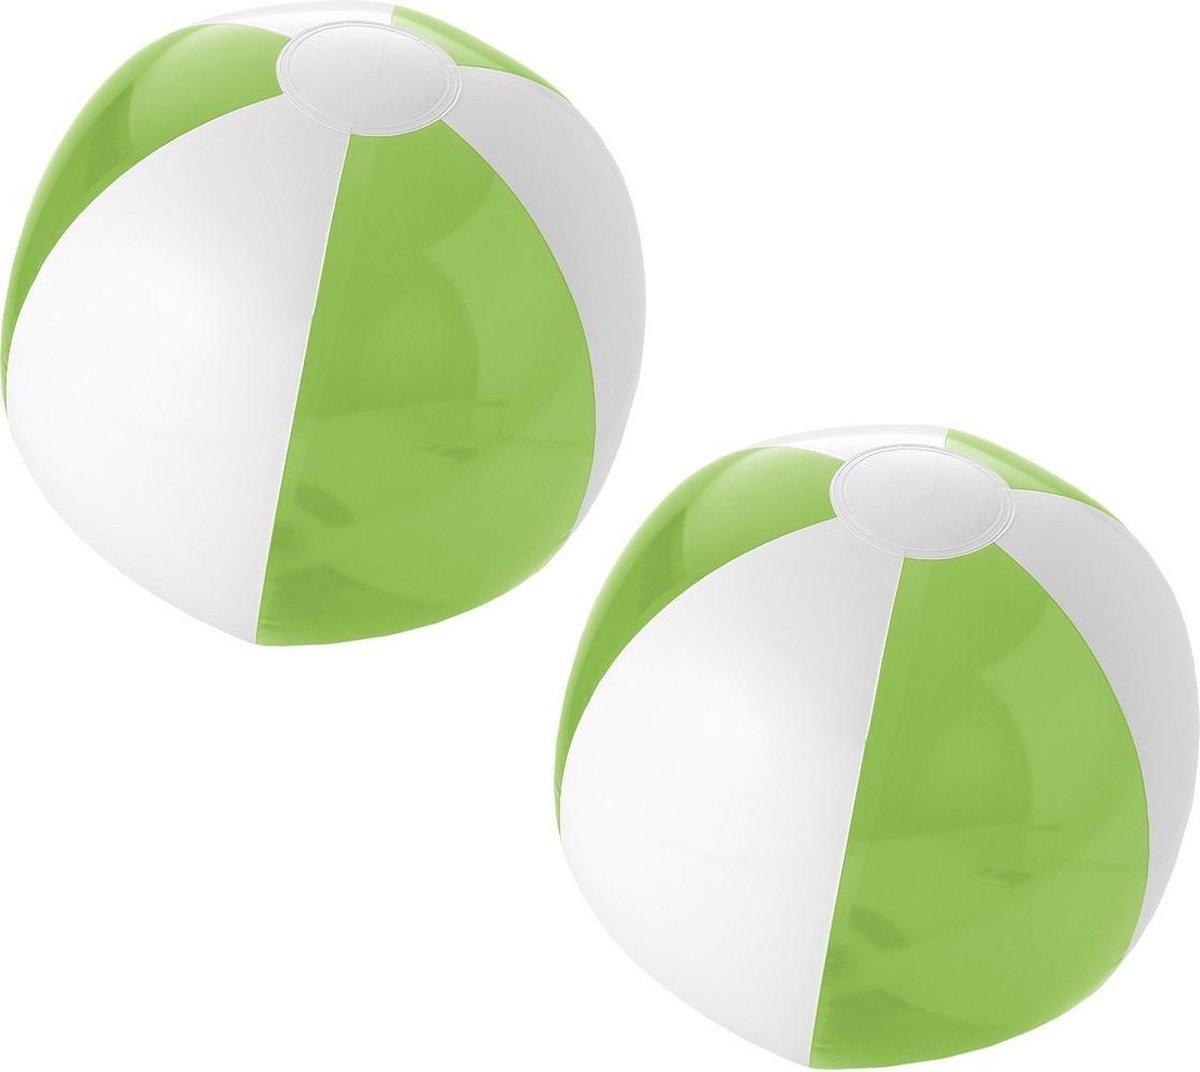 2x stuks opblaasbare strandballen groen/wit 30 cm - Buitenspeelgoed waterspeelgoed opblaasbaar